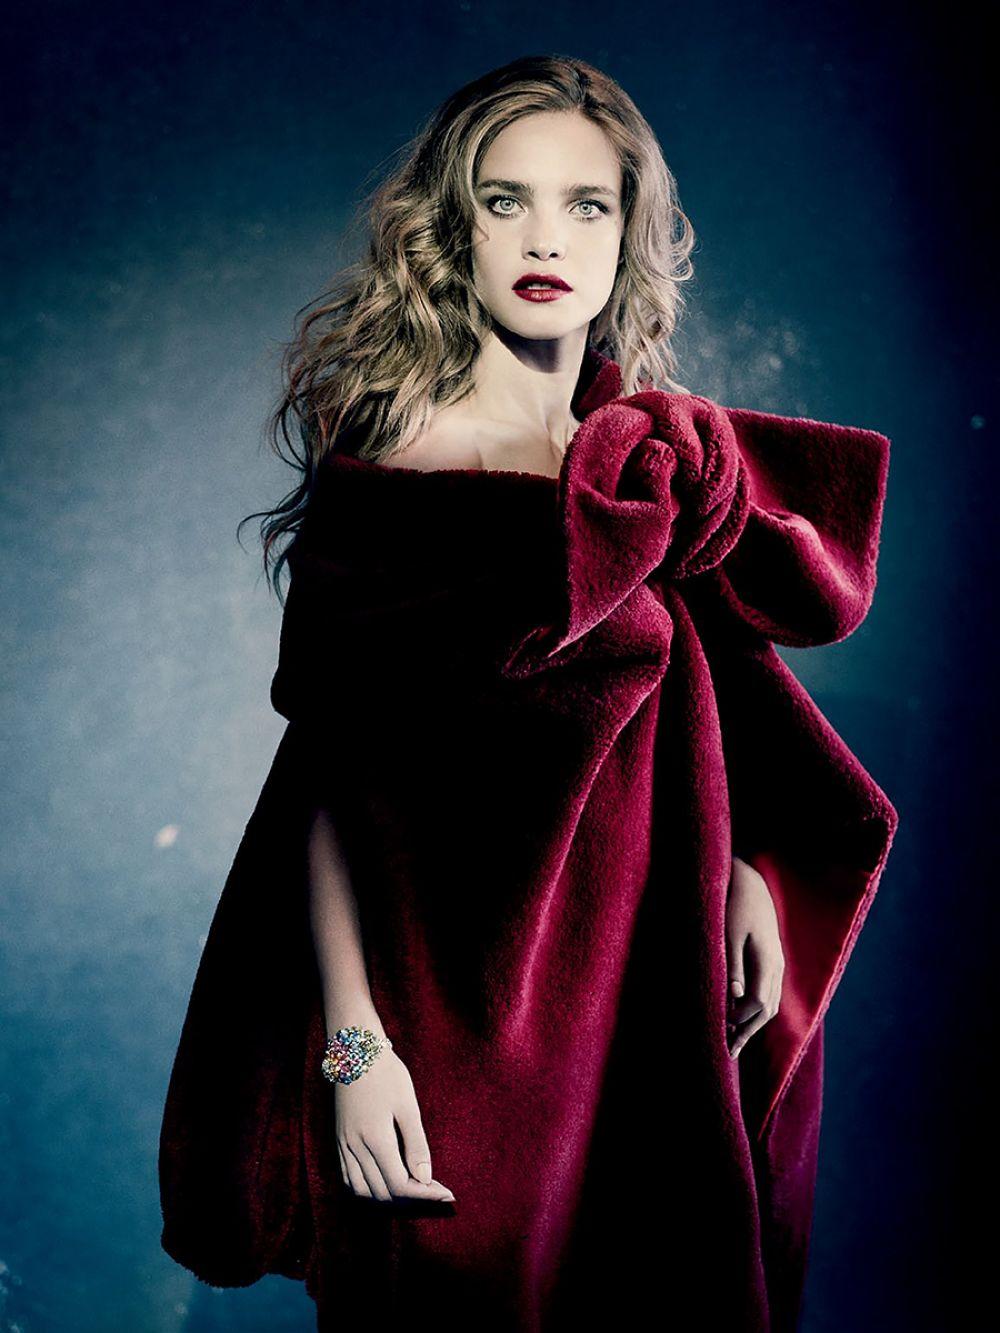 NATALIA VODIANOVA - Paolo Roversi Photoshoot for Vogue Magazine, Russia December 2014 Issue